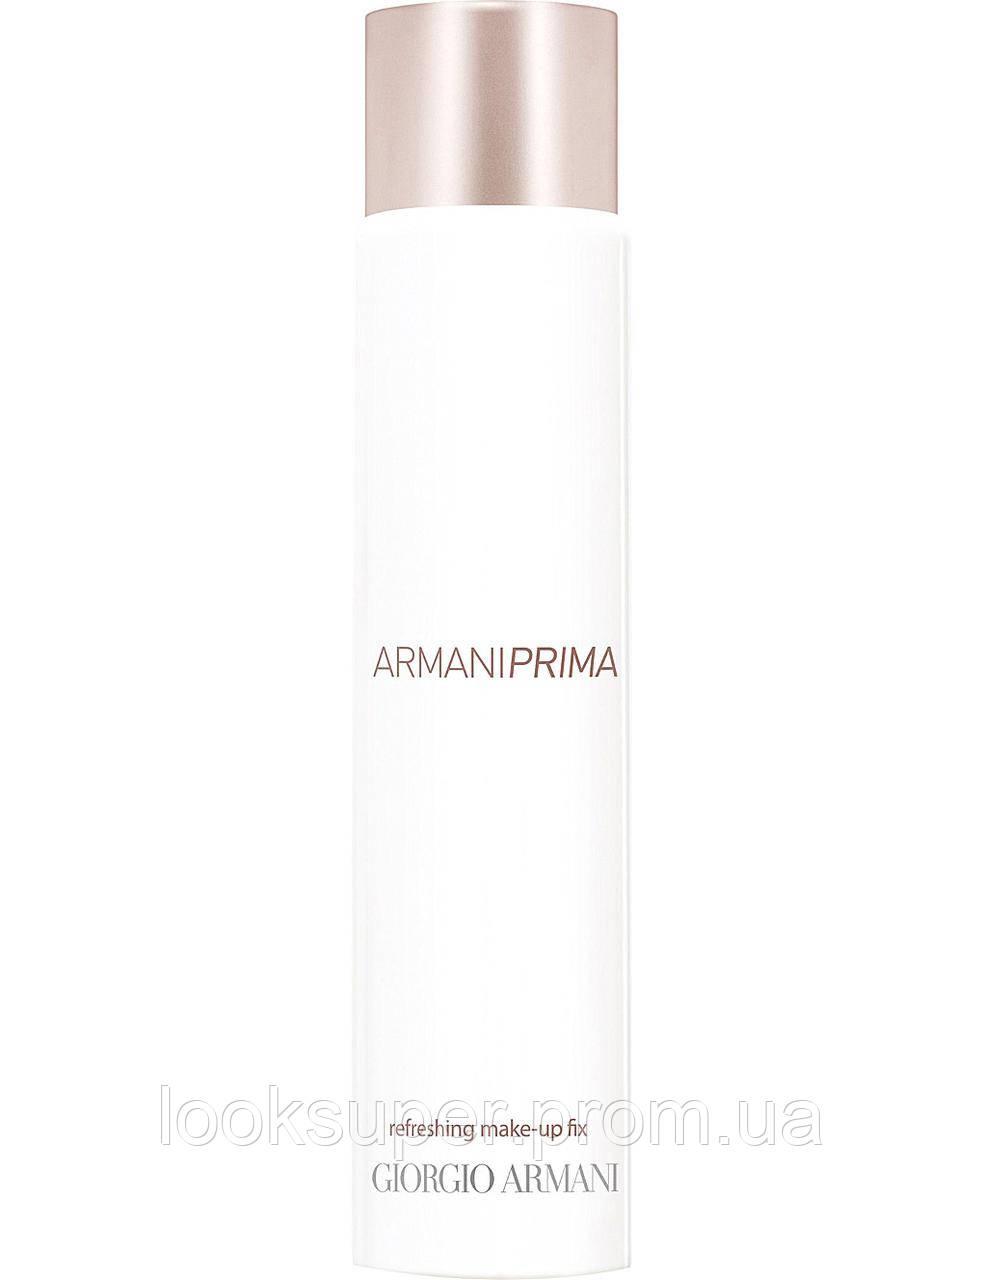 Фиксатор GIORGIO ARMANI Prima Make-Up Fix 150ml